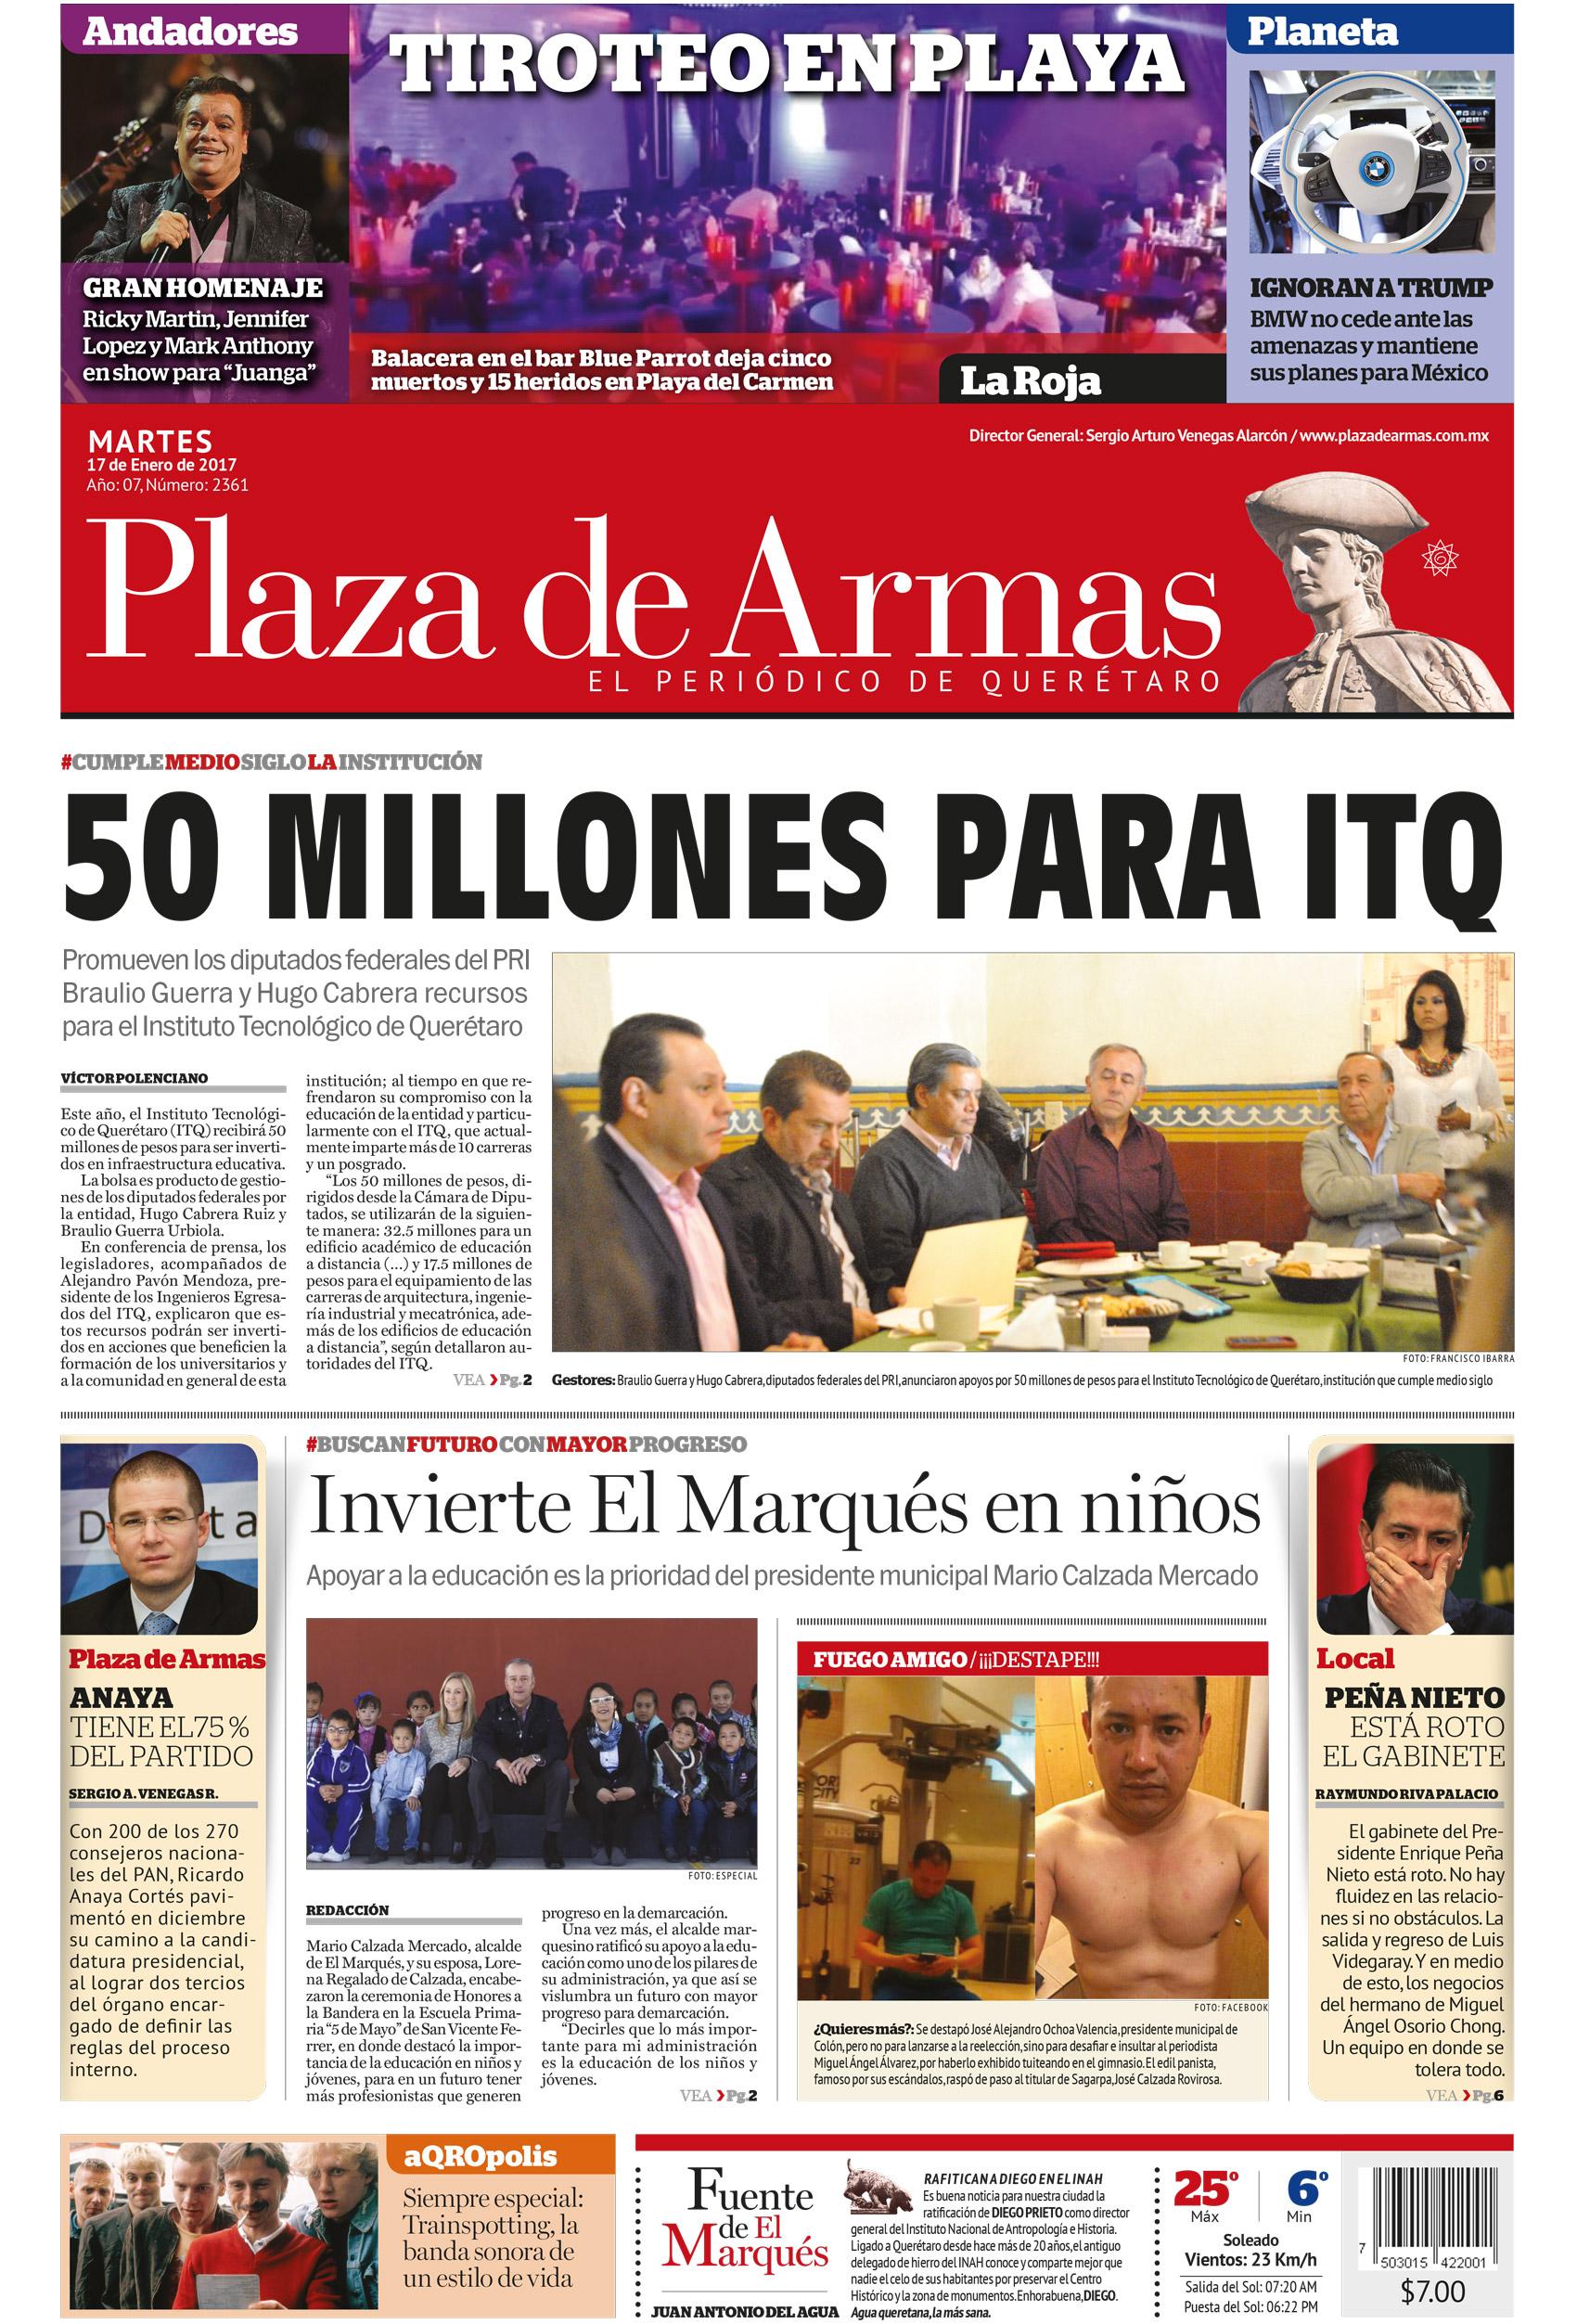 PORTADA DE HOY - Plaza de Armas | QuerétaroPlaza de Armas